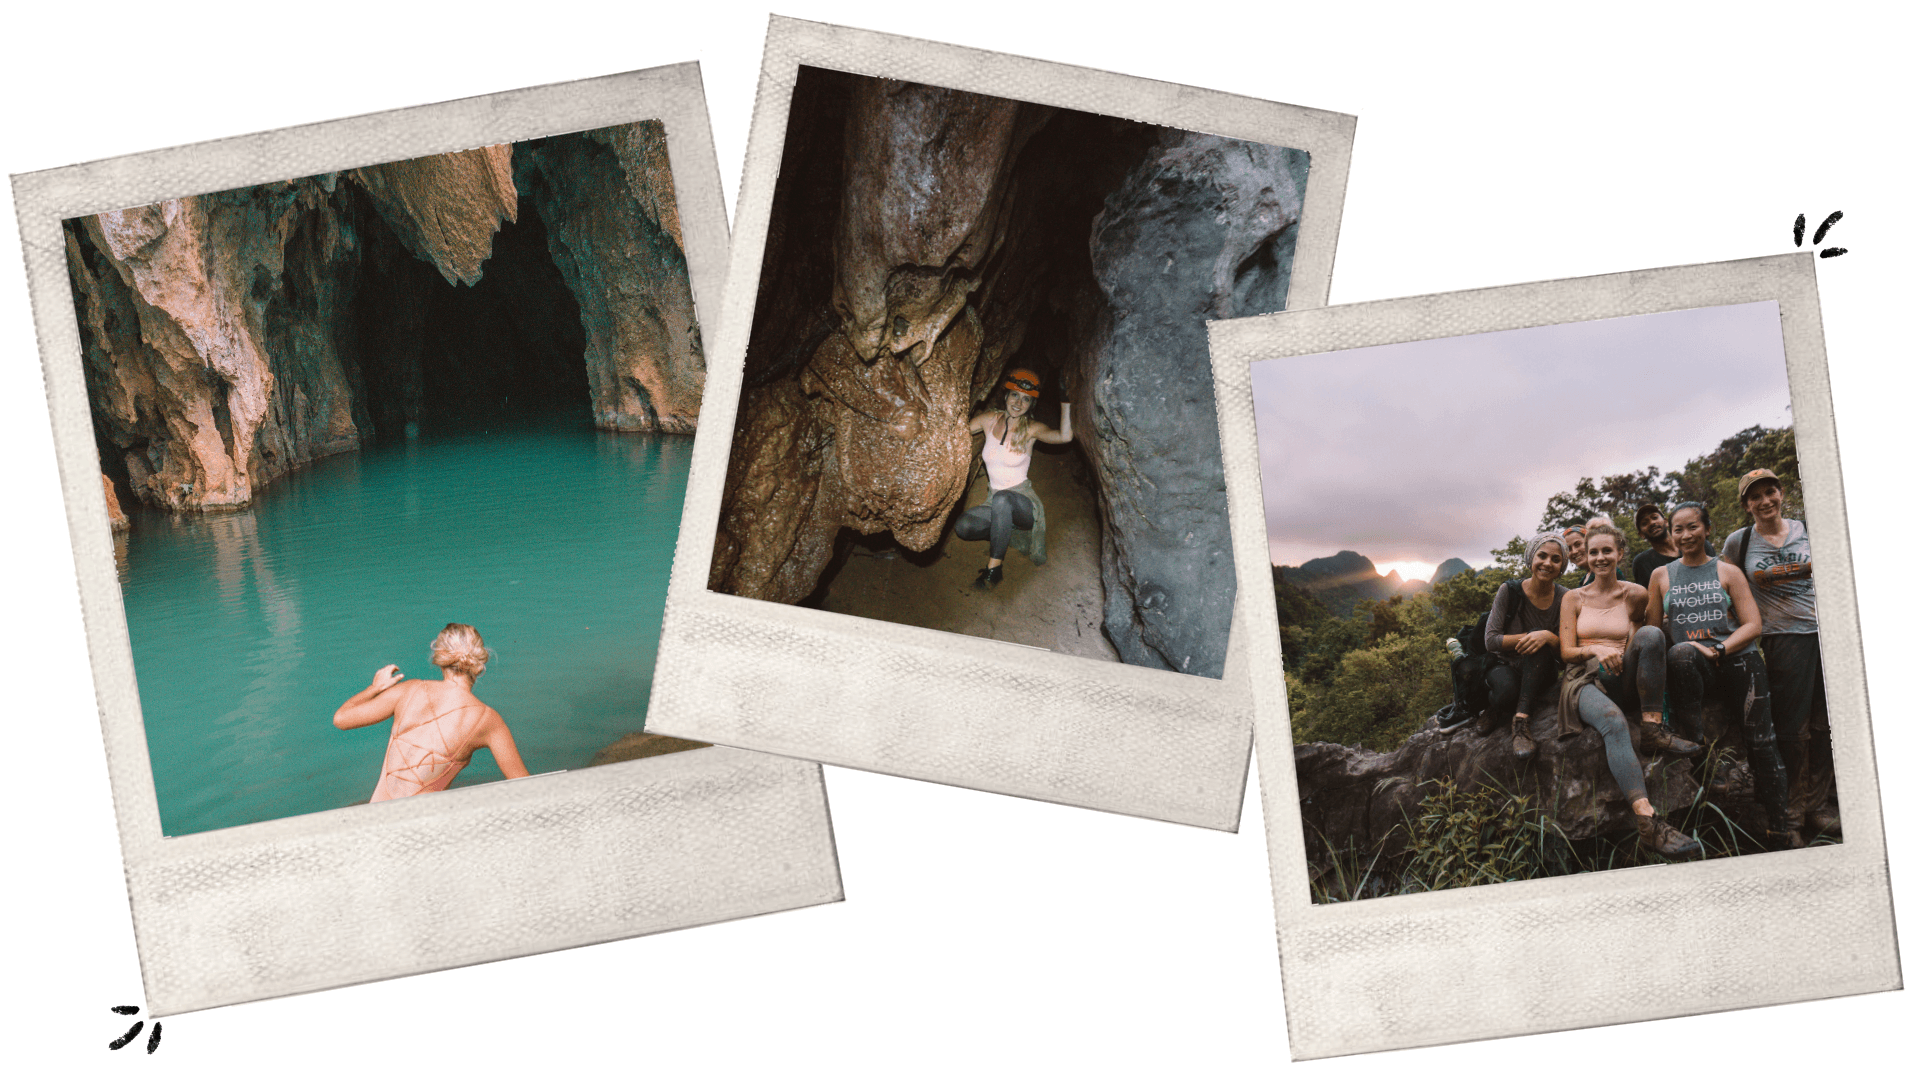 10 Best Things to do in Phong Nha JungleBoss trek